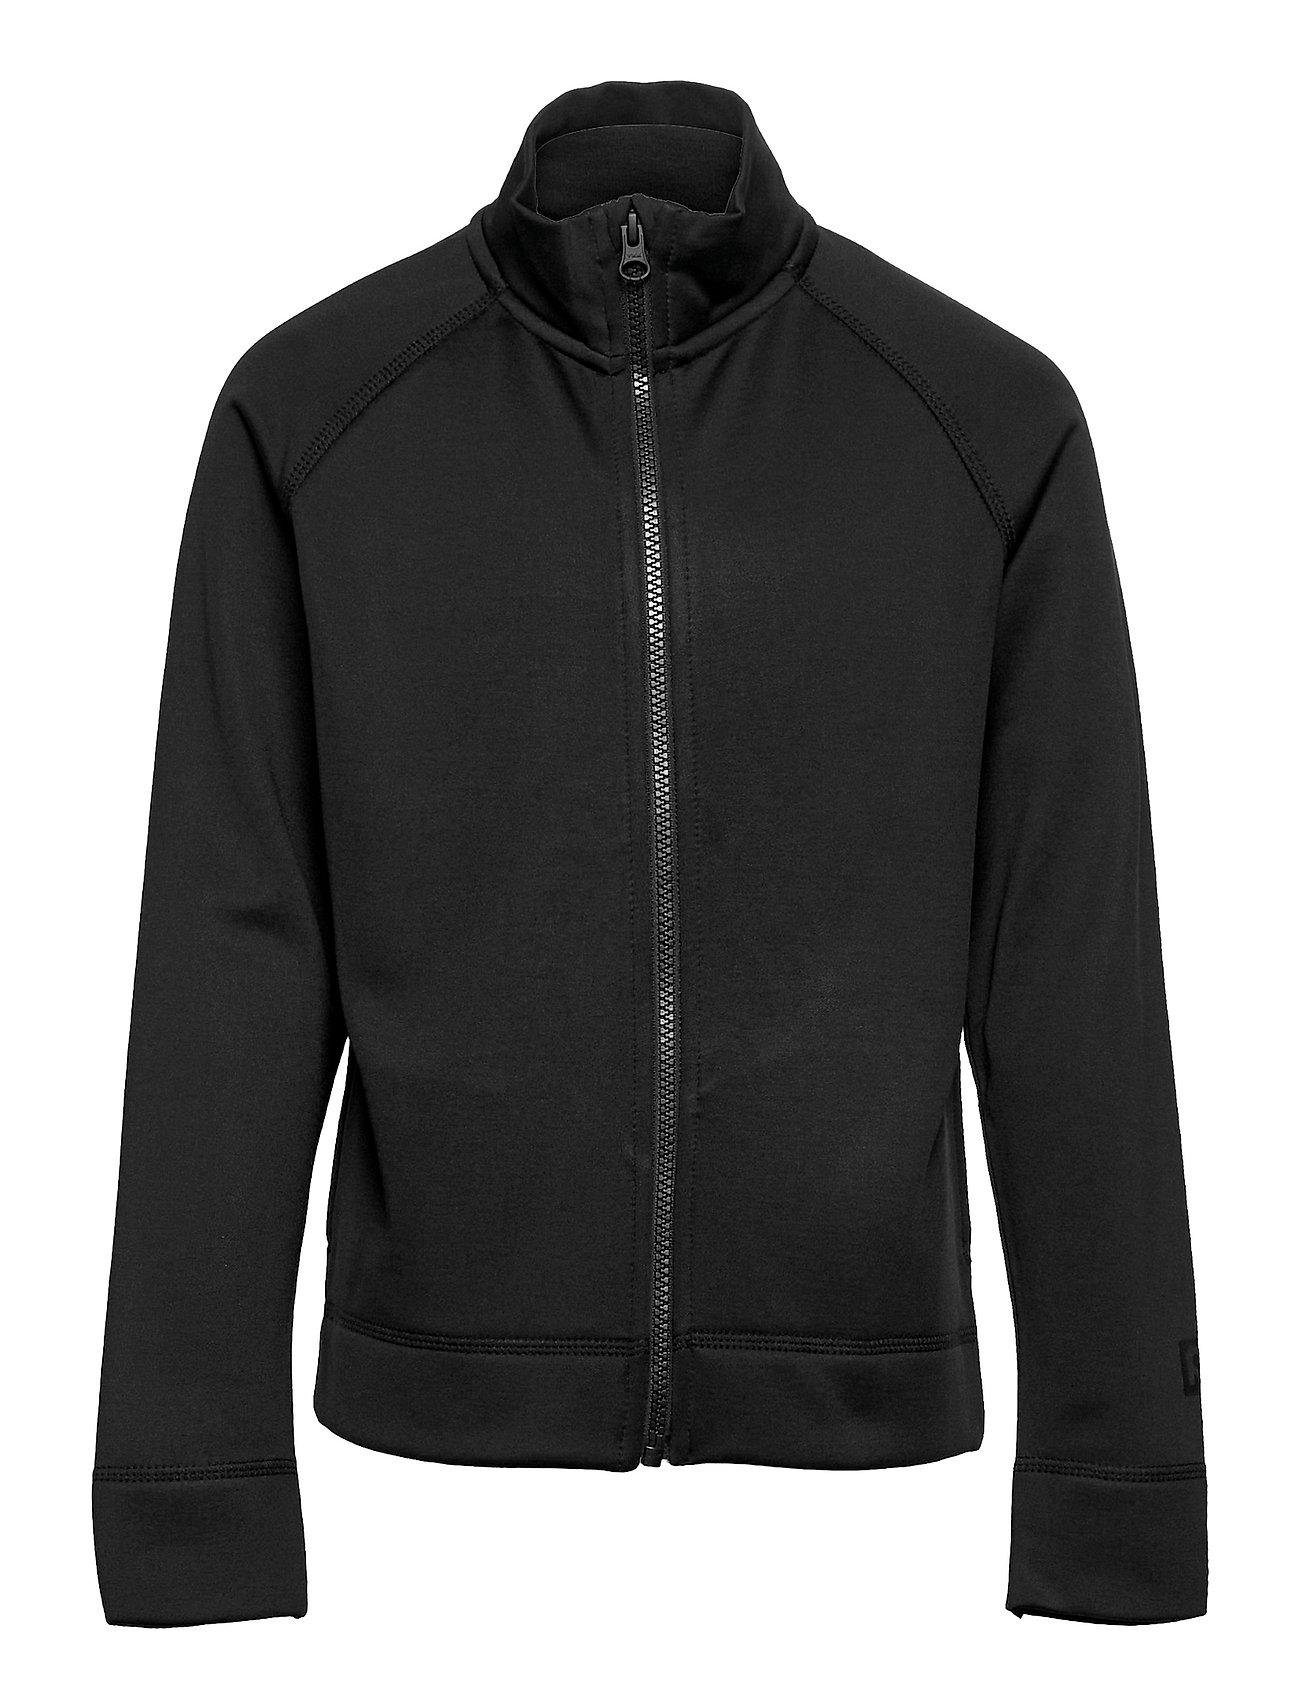 Johtaen Outerwear Fleece Outerwear Fleece Jackets Sort Reima